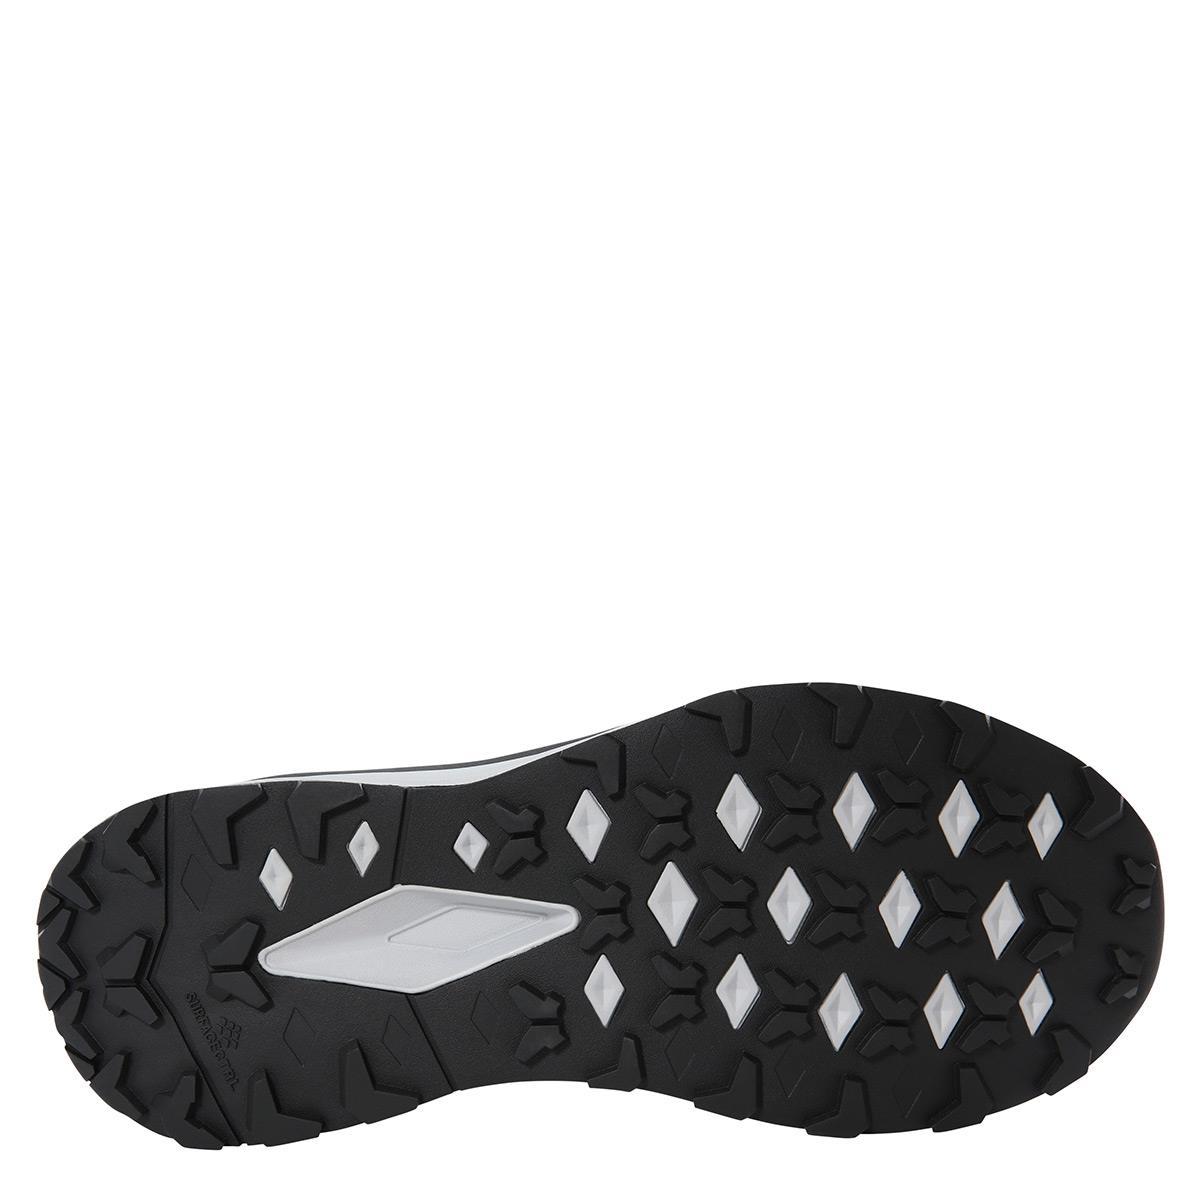 The North Face M VECTIV ENDURIS Erkek Ayakkabısı NF0A4T3PLA91